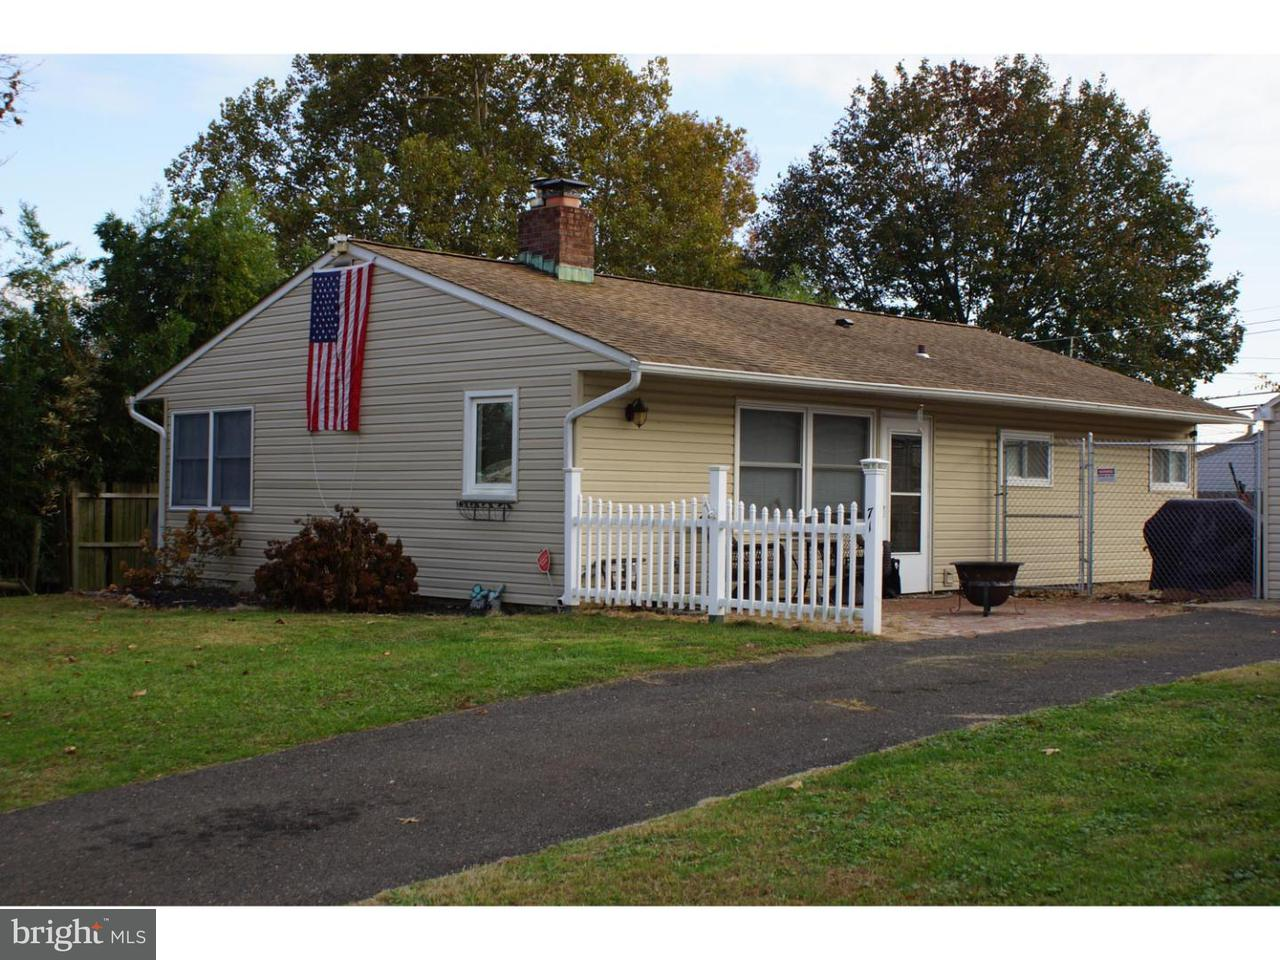 Single Family Home for Rent at 71 BLACK PINE Lane Levittown, Pennsylvania 19054 United States